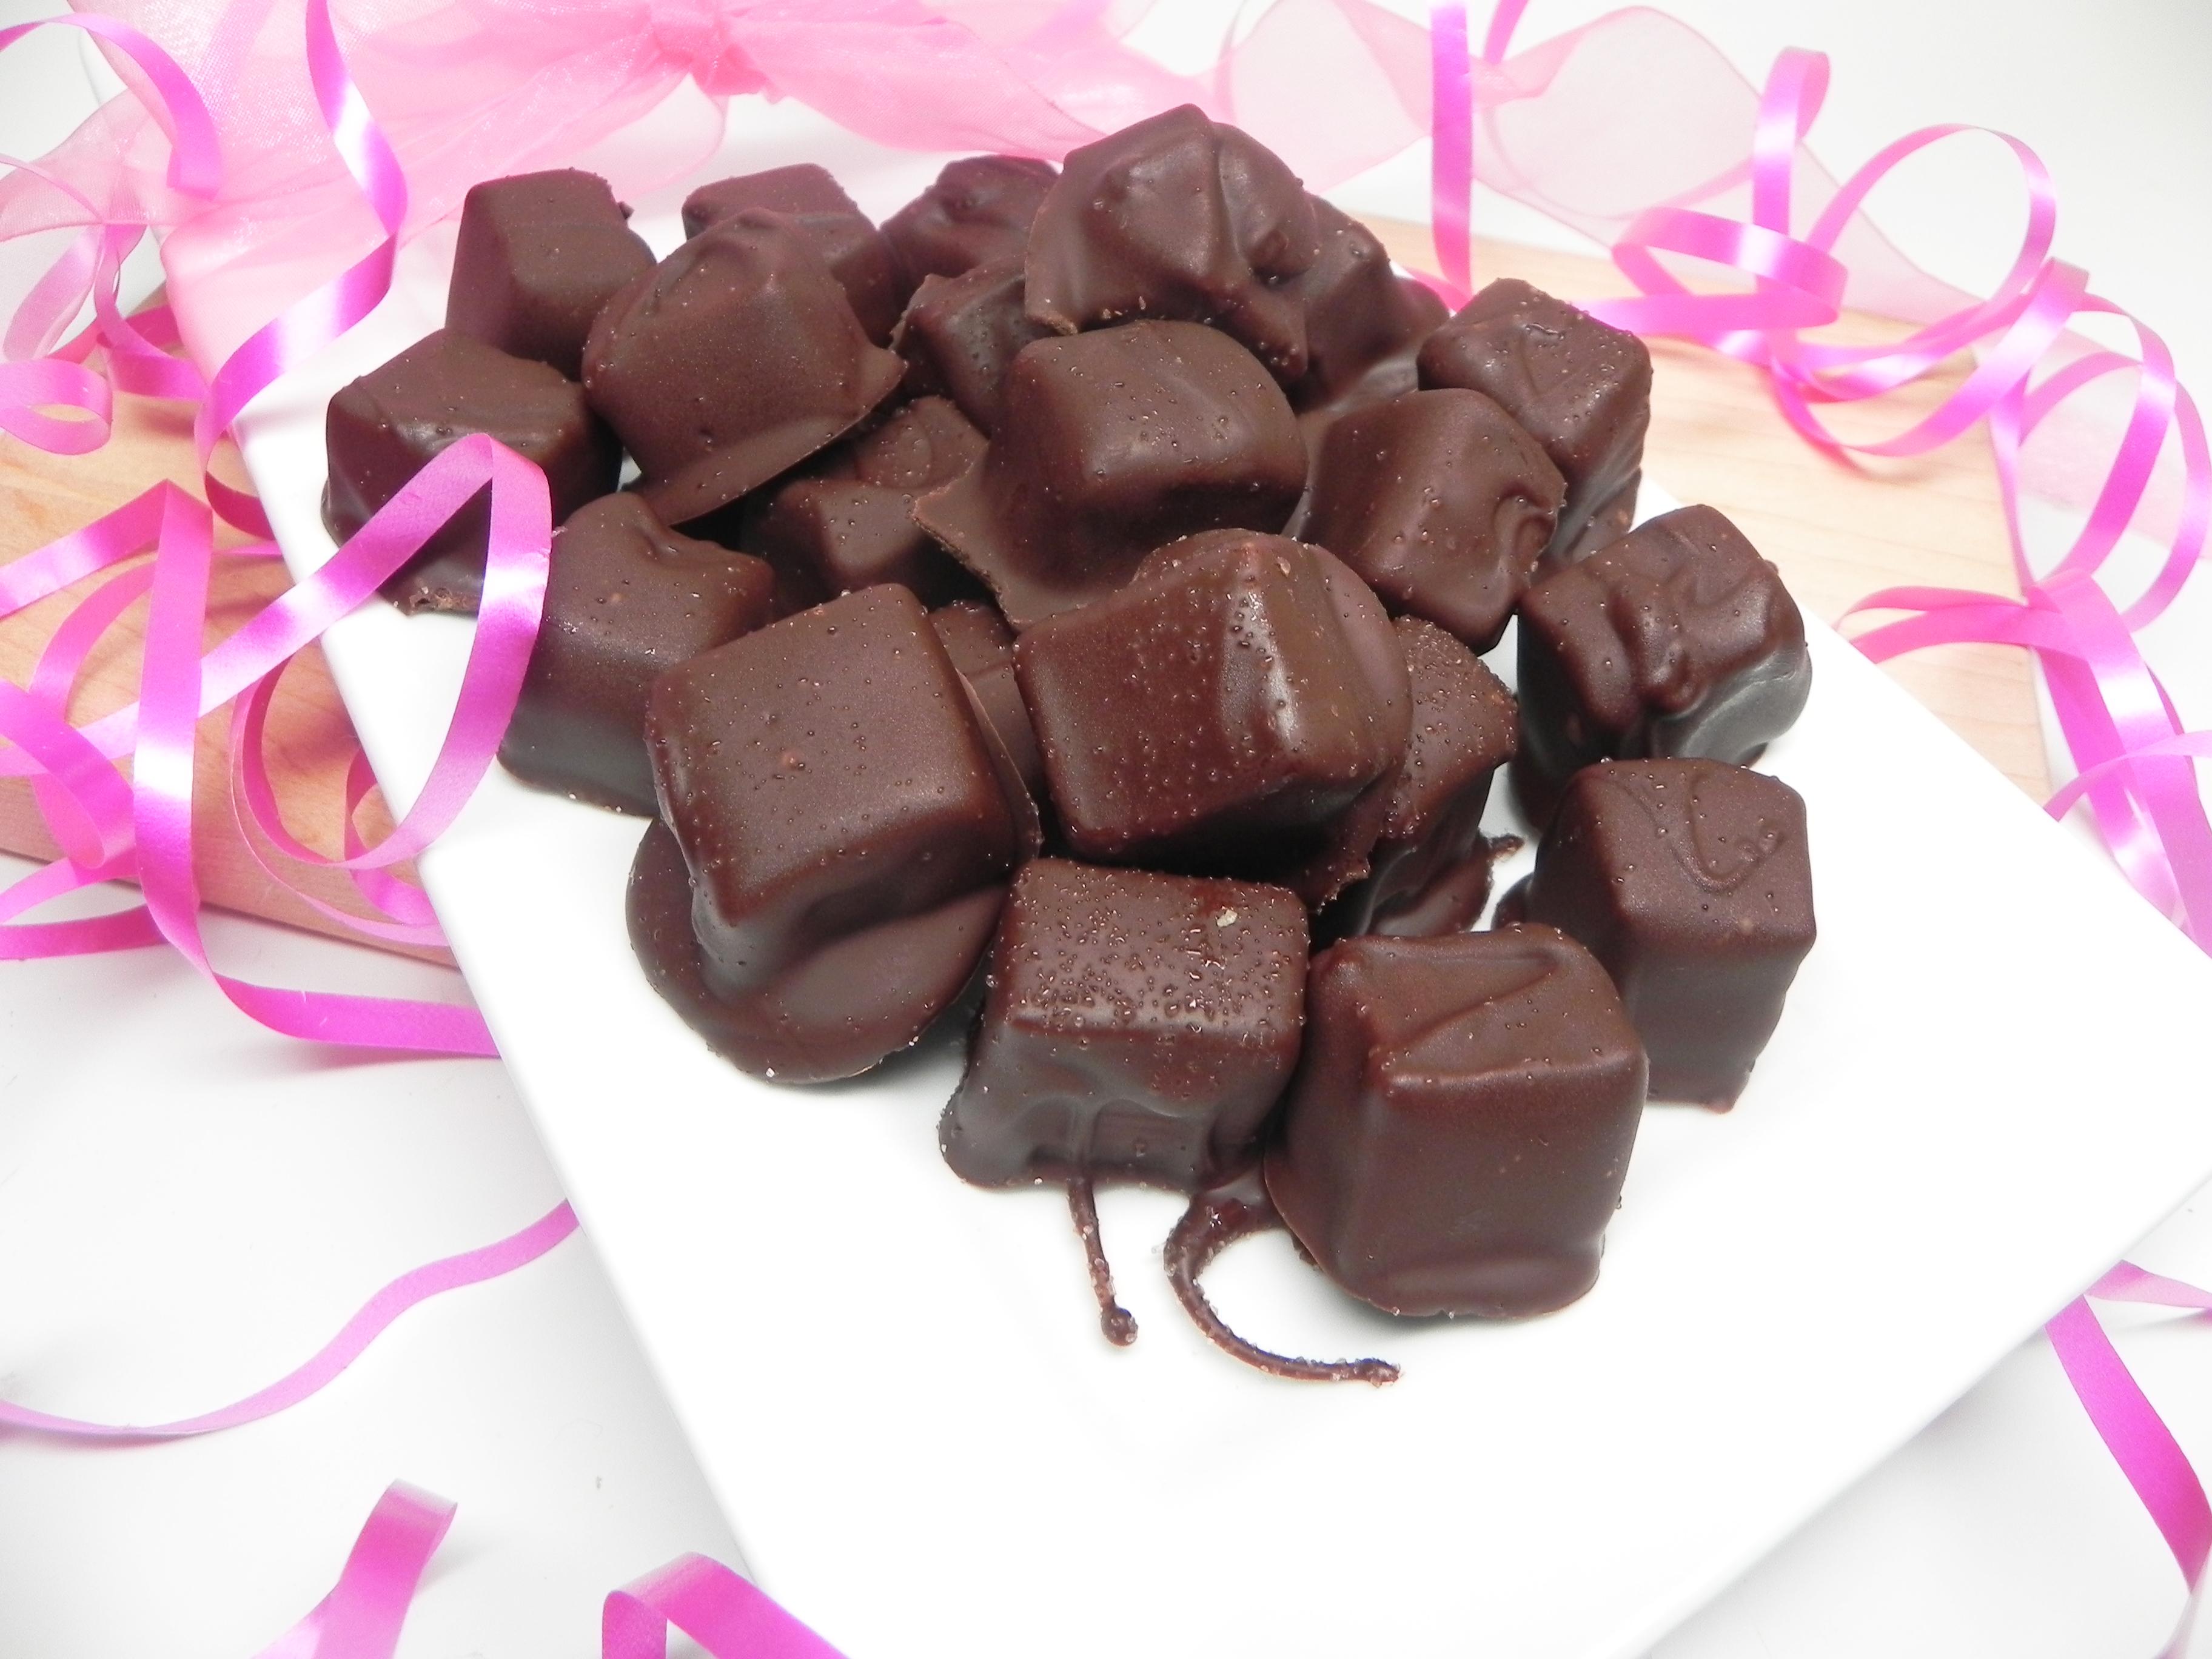 Homemade Caramels with Dark Chocolate and Sea Salt